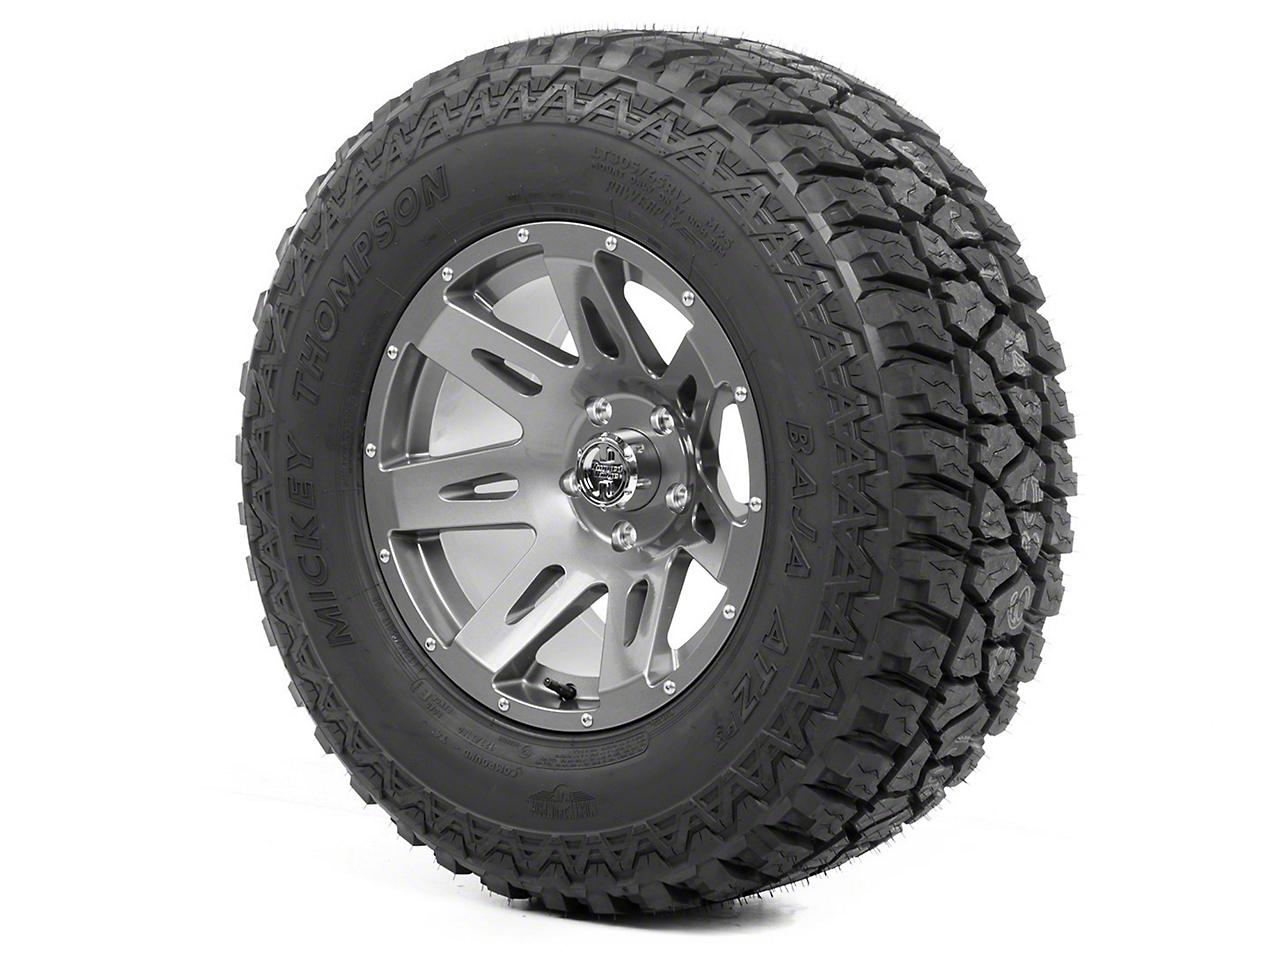 Rugged Ridge XHD Wheel 17x9 Gun Metal and Mickey Thompson ATZ P3 315/70R17 Tire (13-18 Wrangler JK)